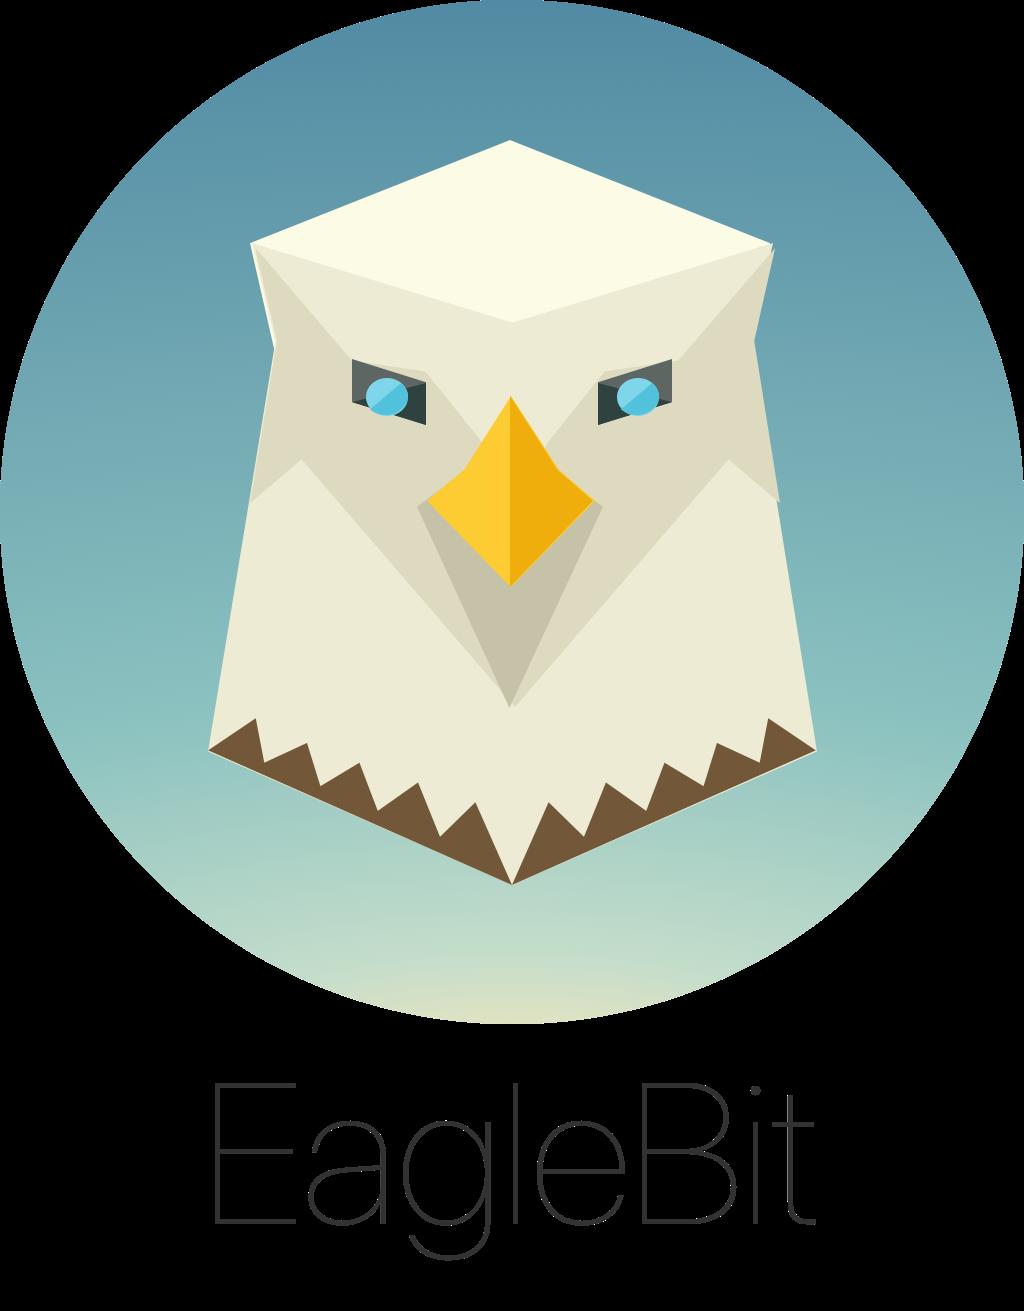 EagleBit